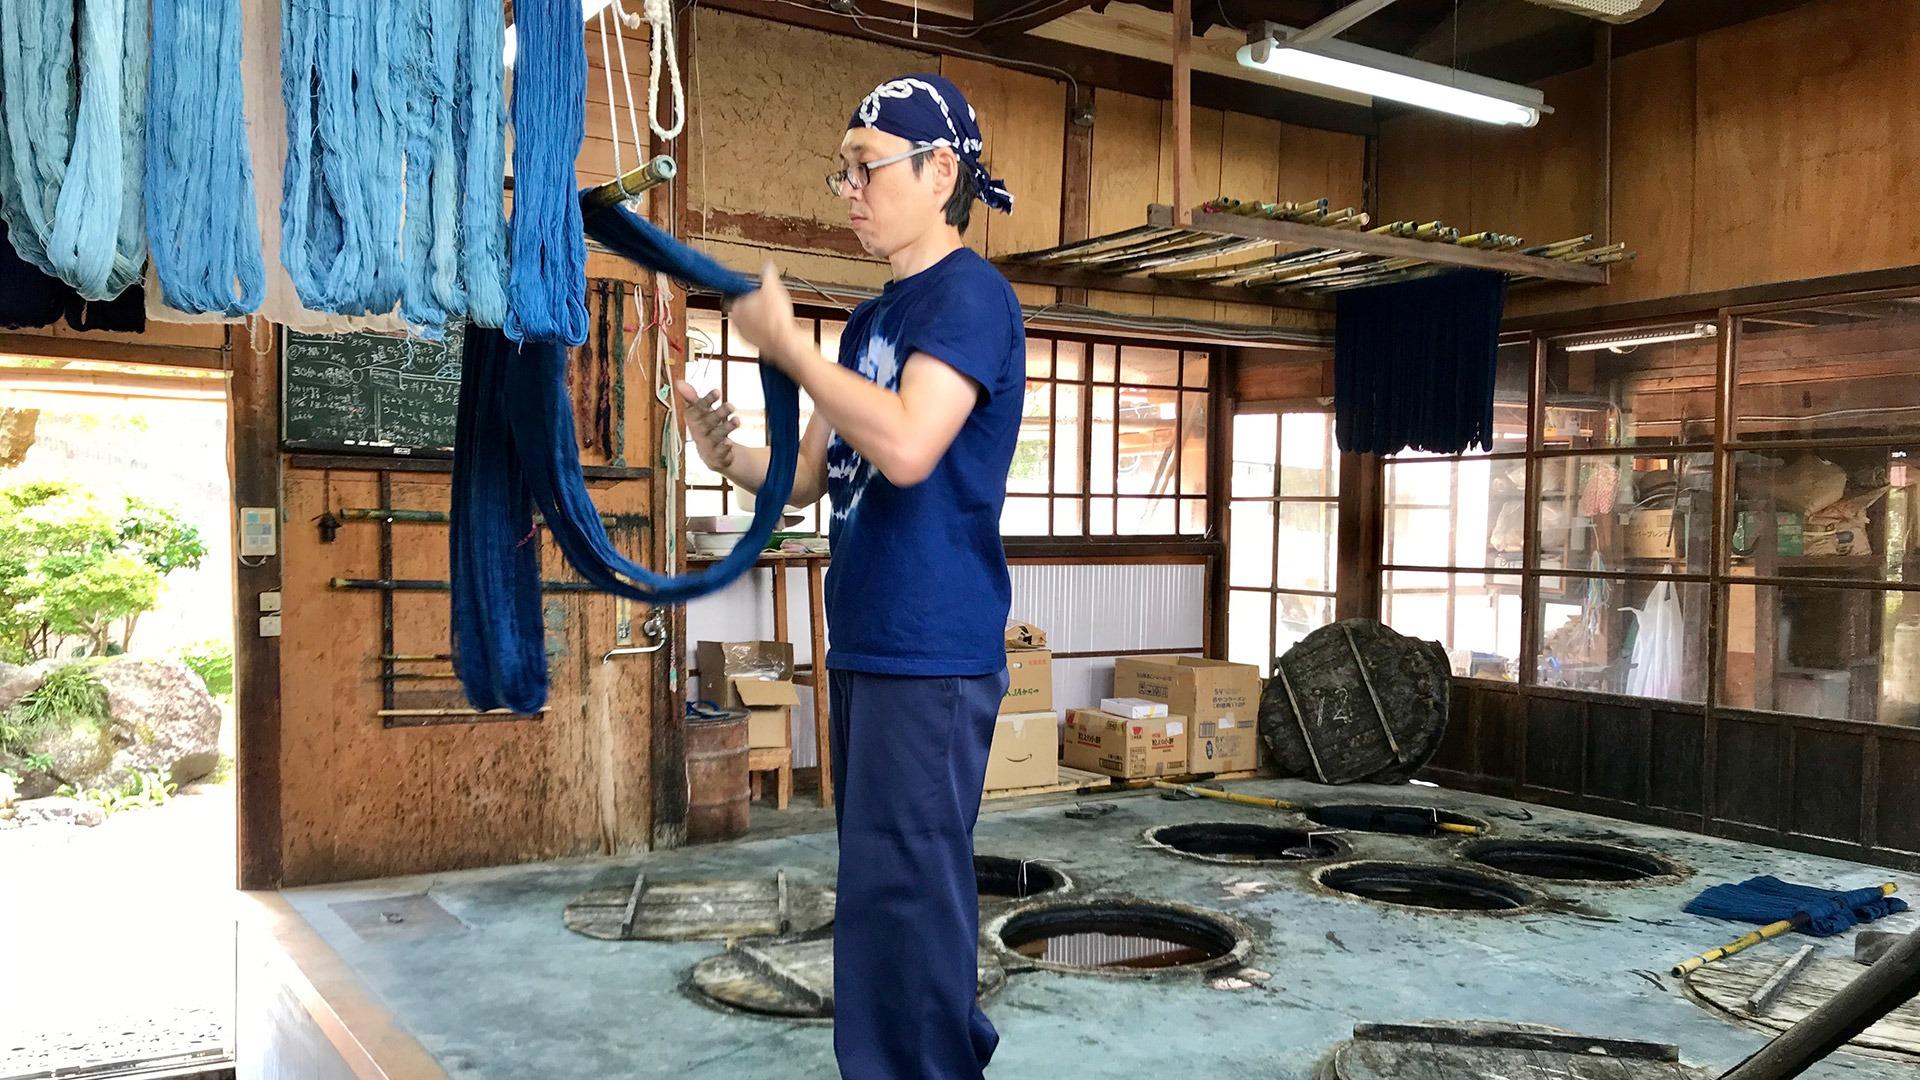 Fifth generation indigo dyeing artist in his workshop in Matsue, Japan